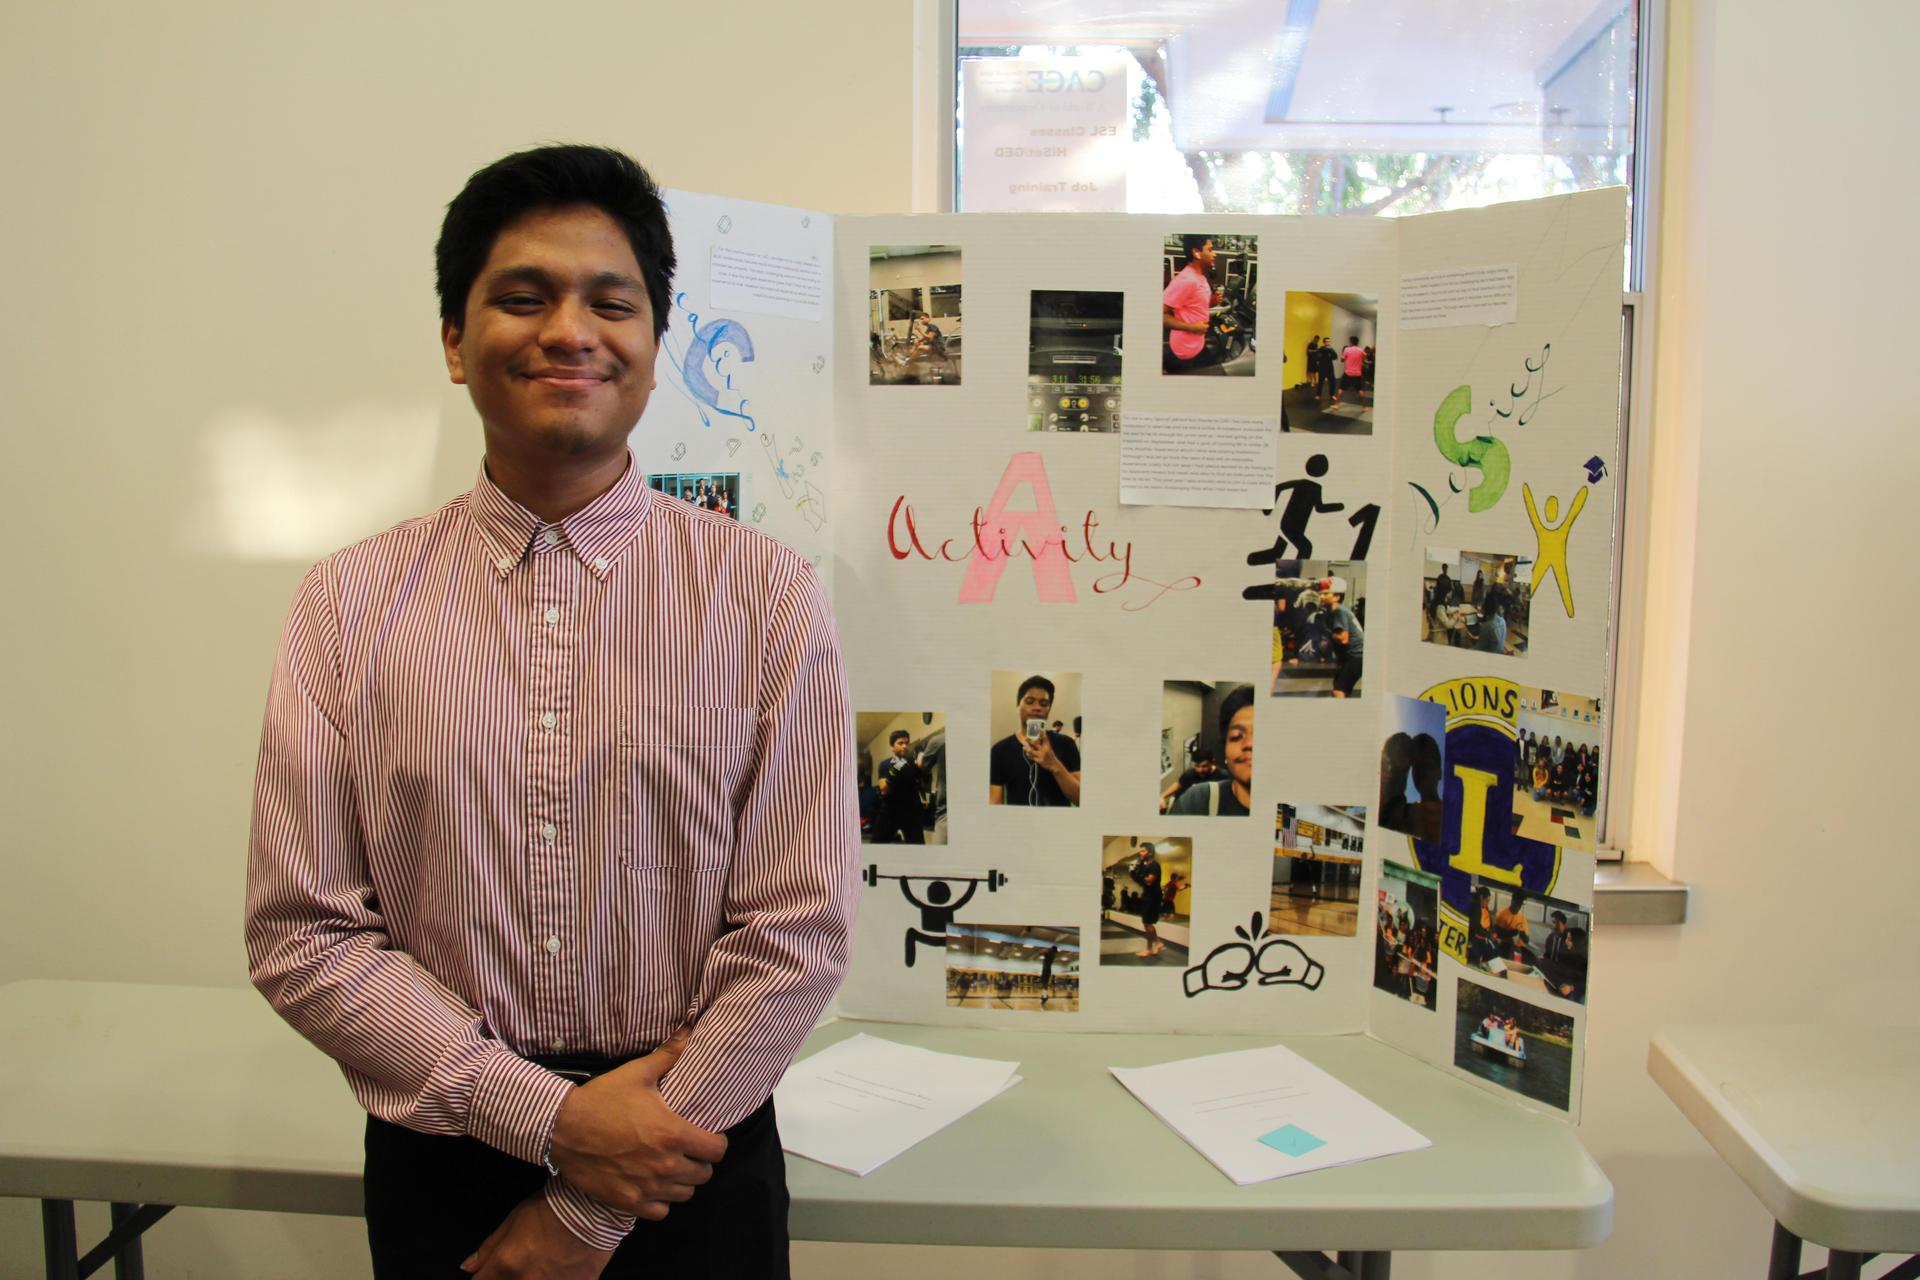 Image of IB Student - Chris - showcasing his Creativity, Activity & Service experiences